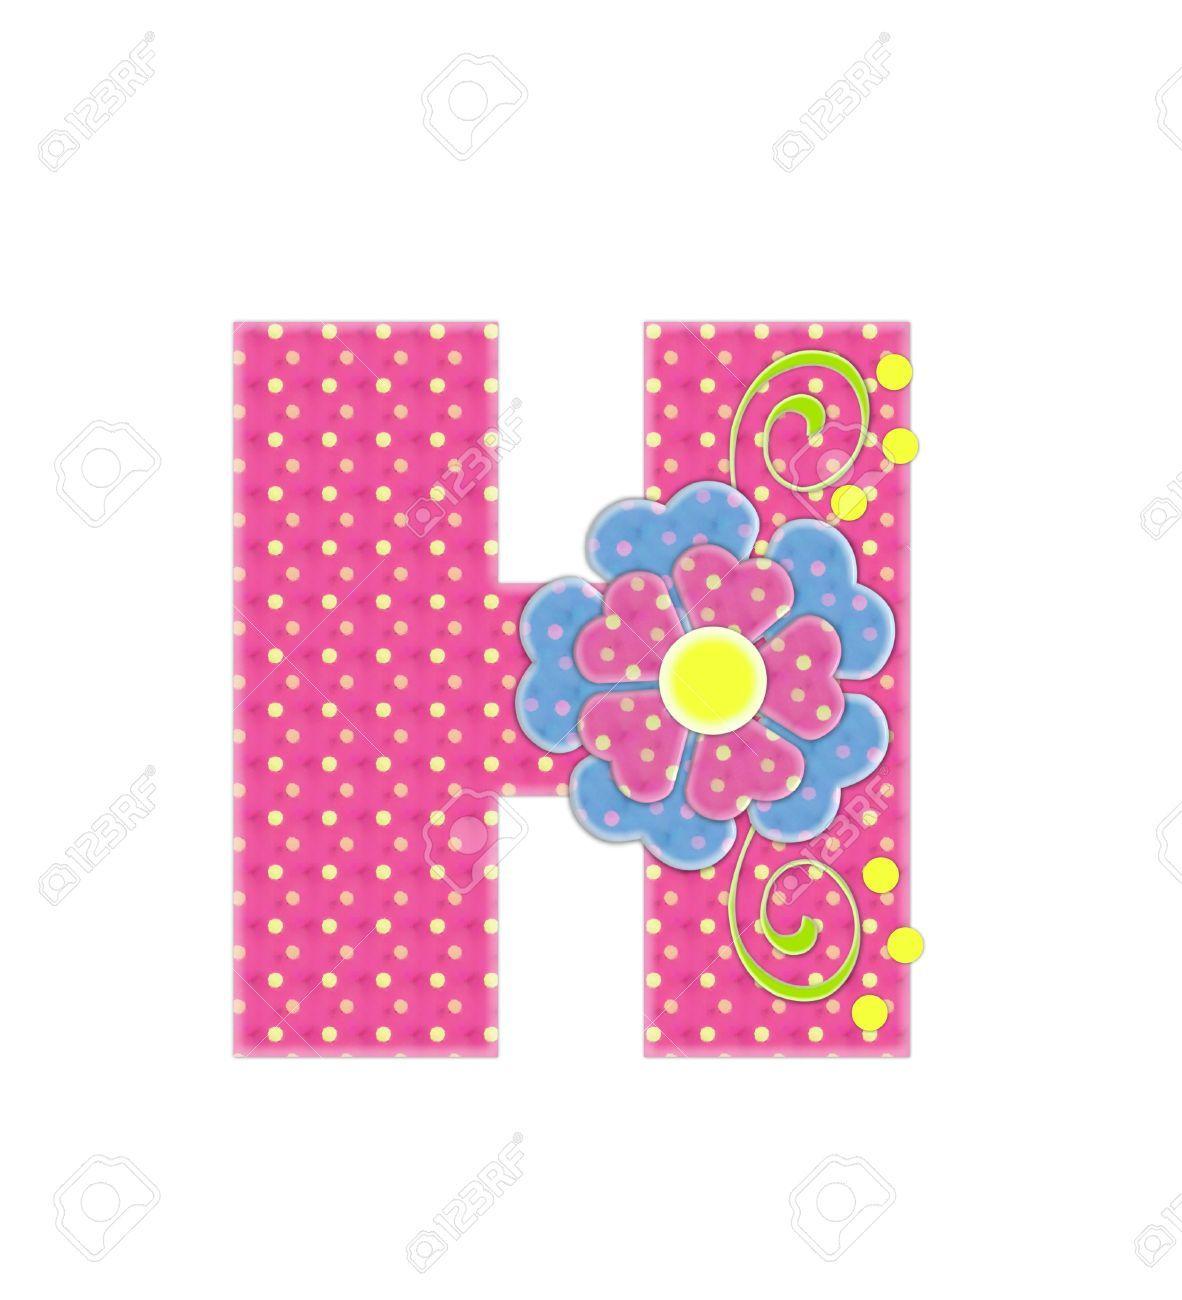 Pin by alessandra resende on adesivos unhas | Pinterest | Fonts